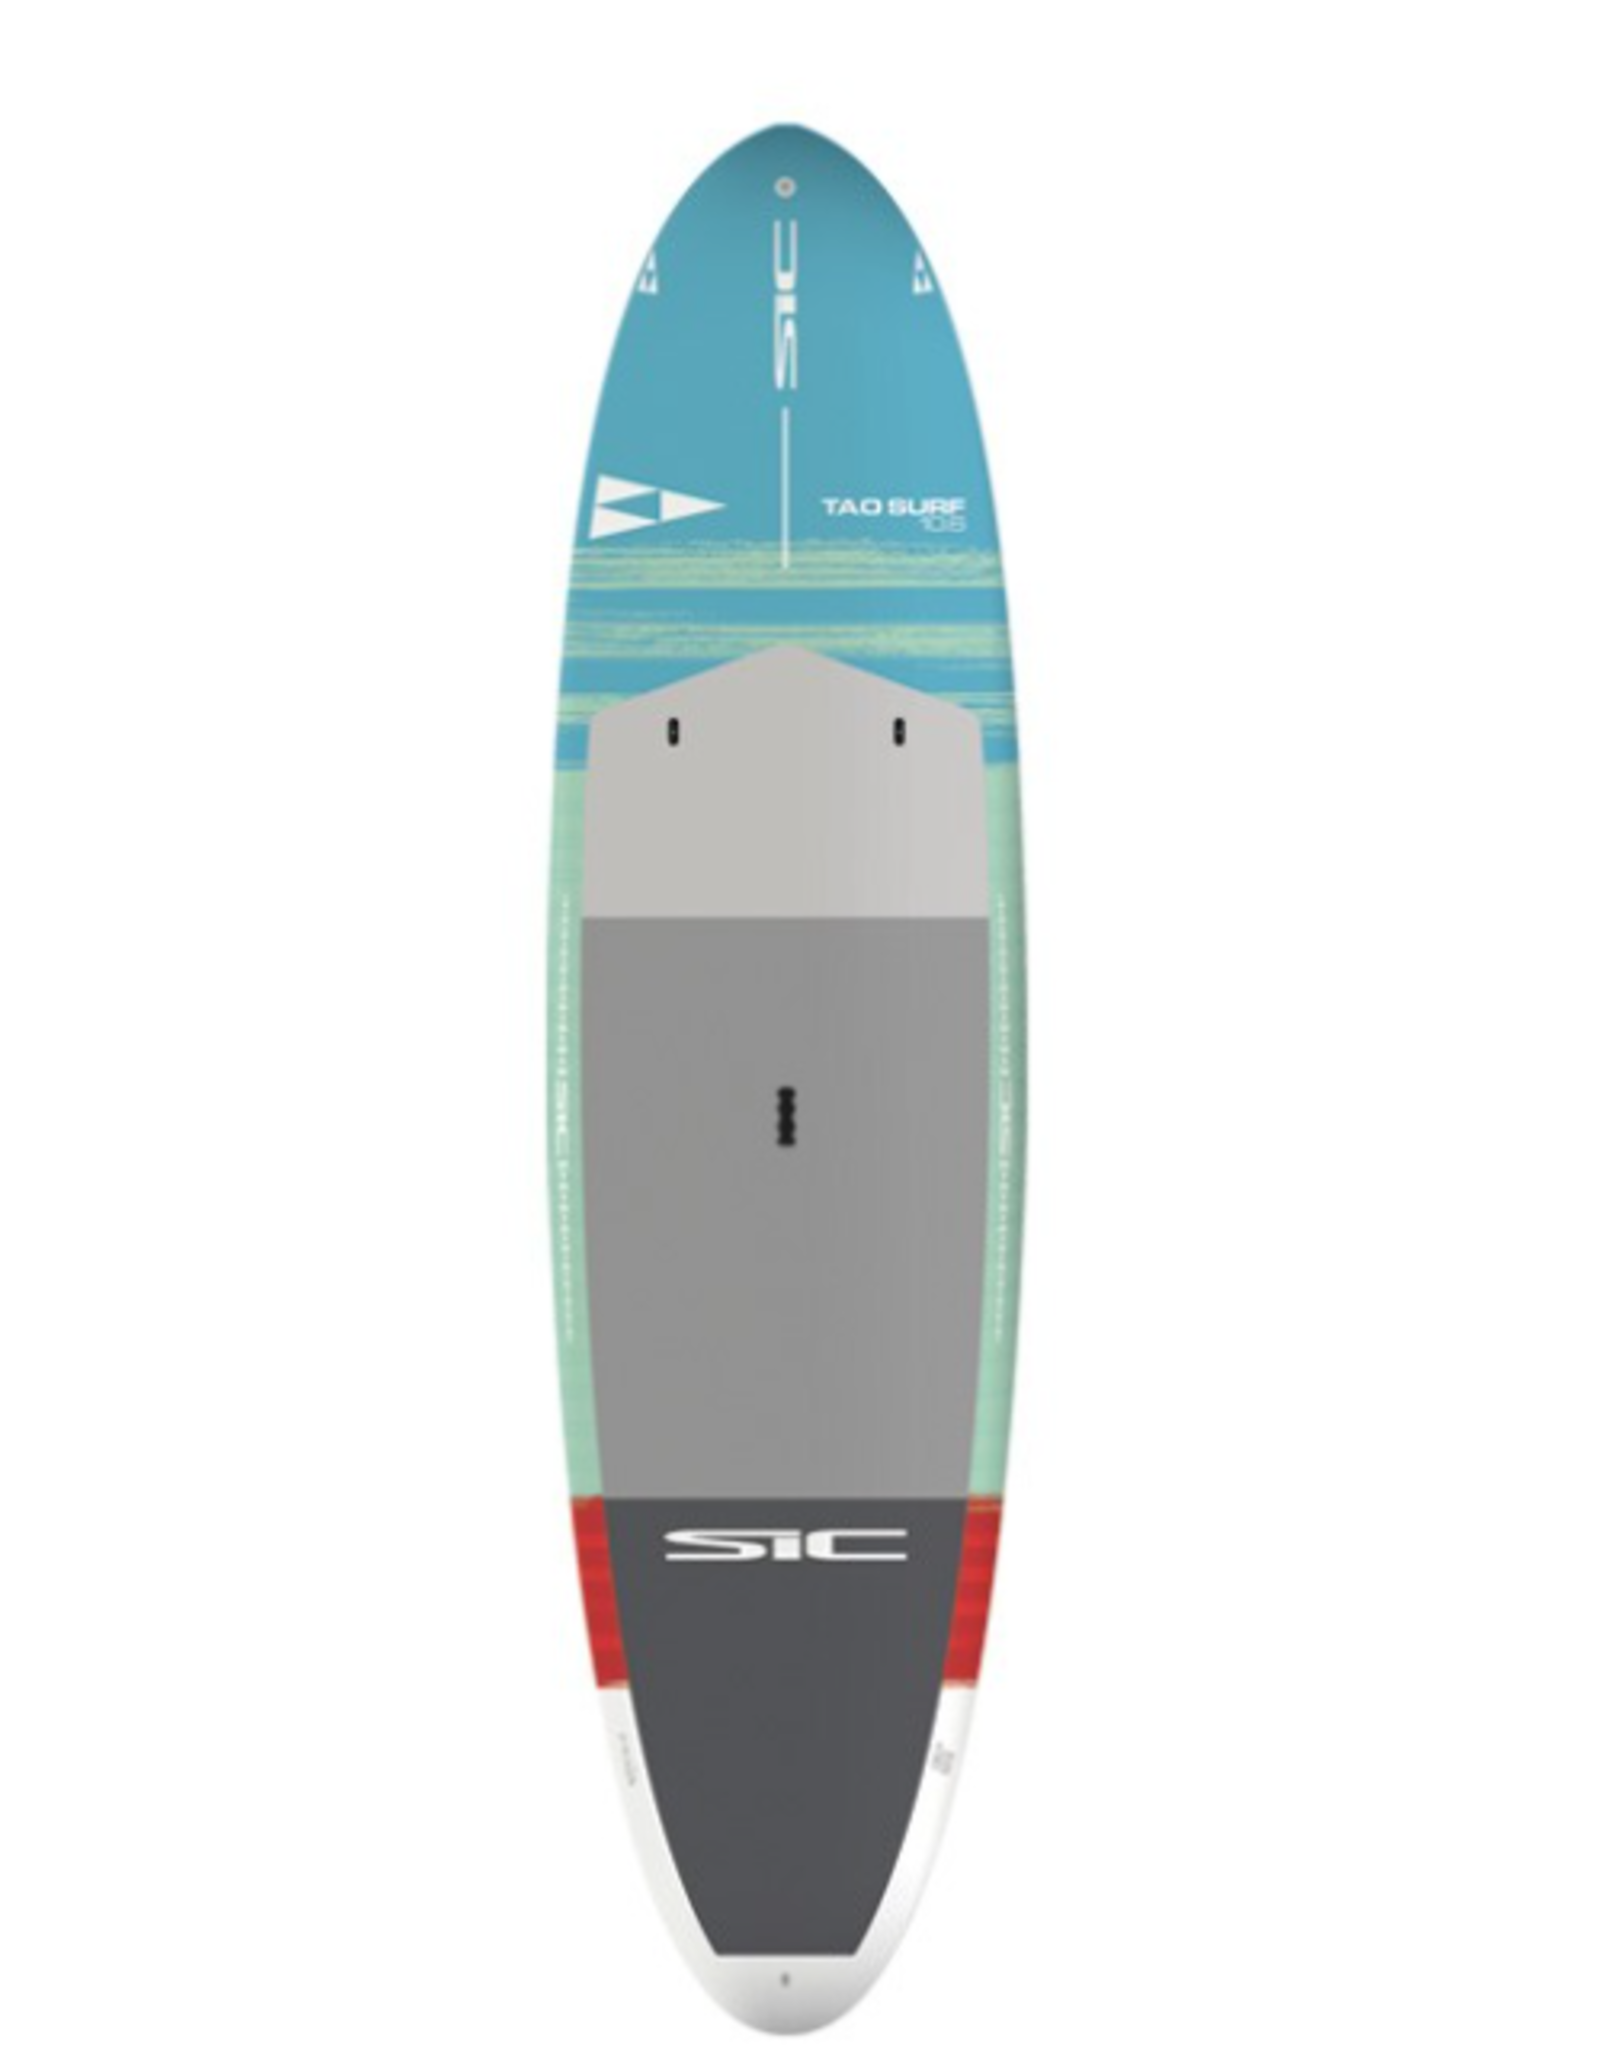 SIC SIC SUP Tao Surf 10.6